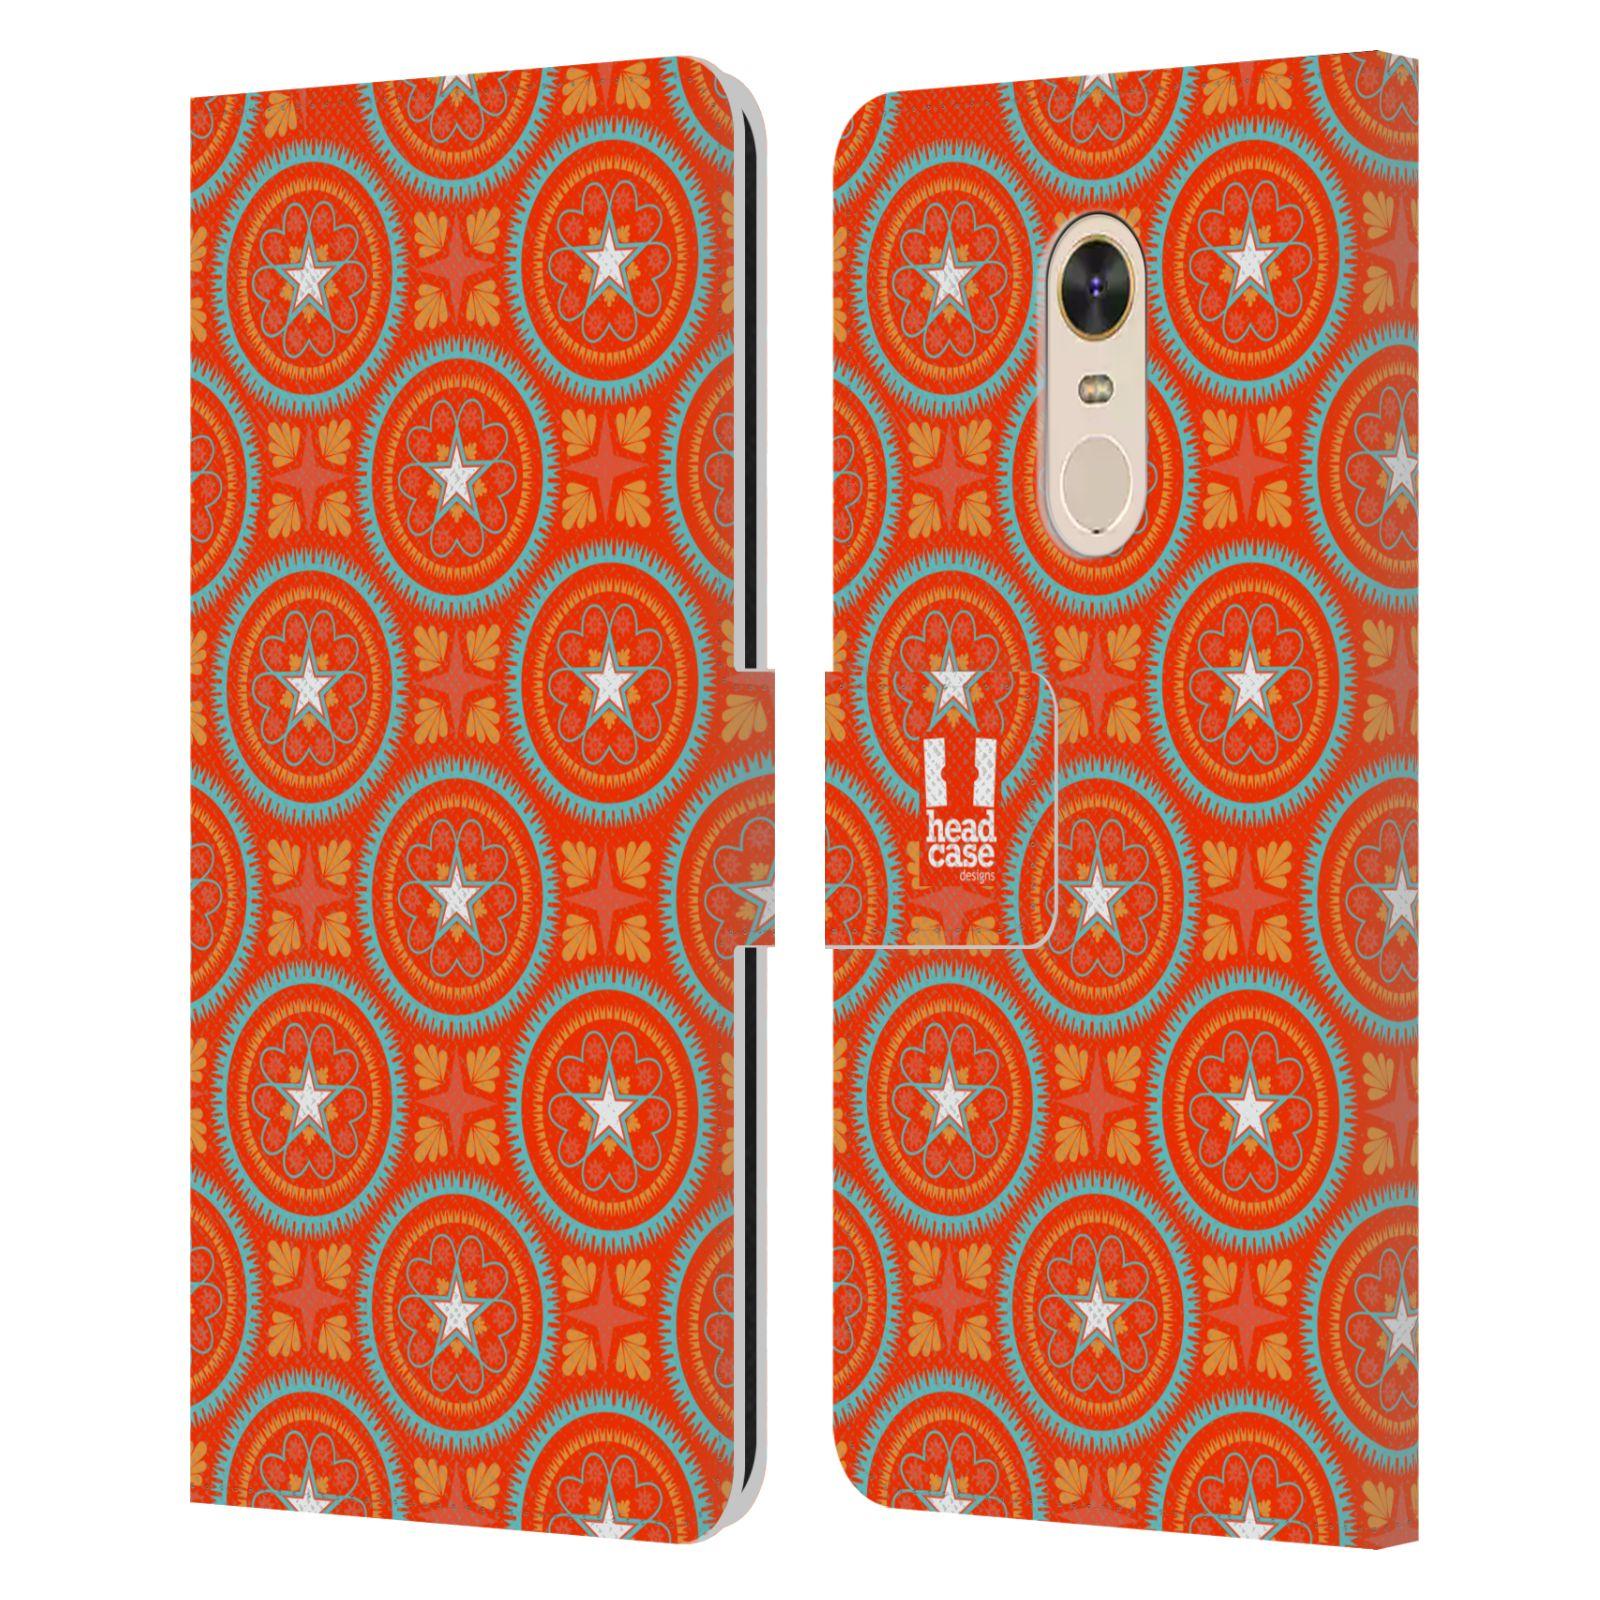 HEAD CASE Flipové pouzdro pro mobil Xiaomi Redmi 5 PLUS Slovanský vzor oranžová hvězda